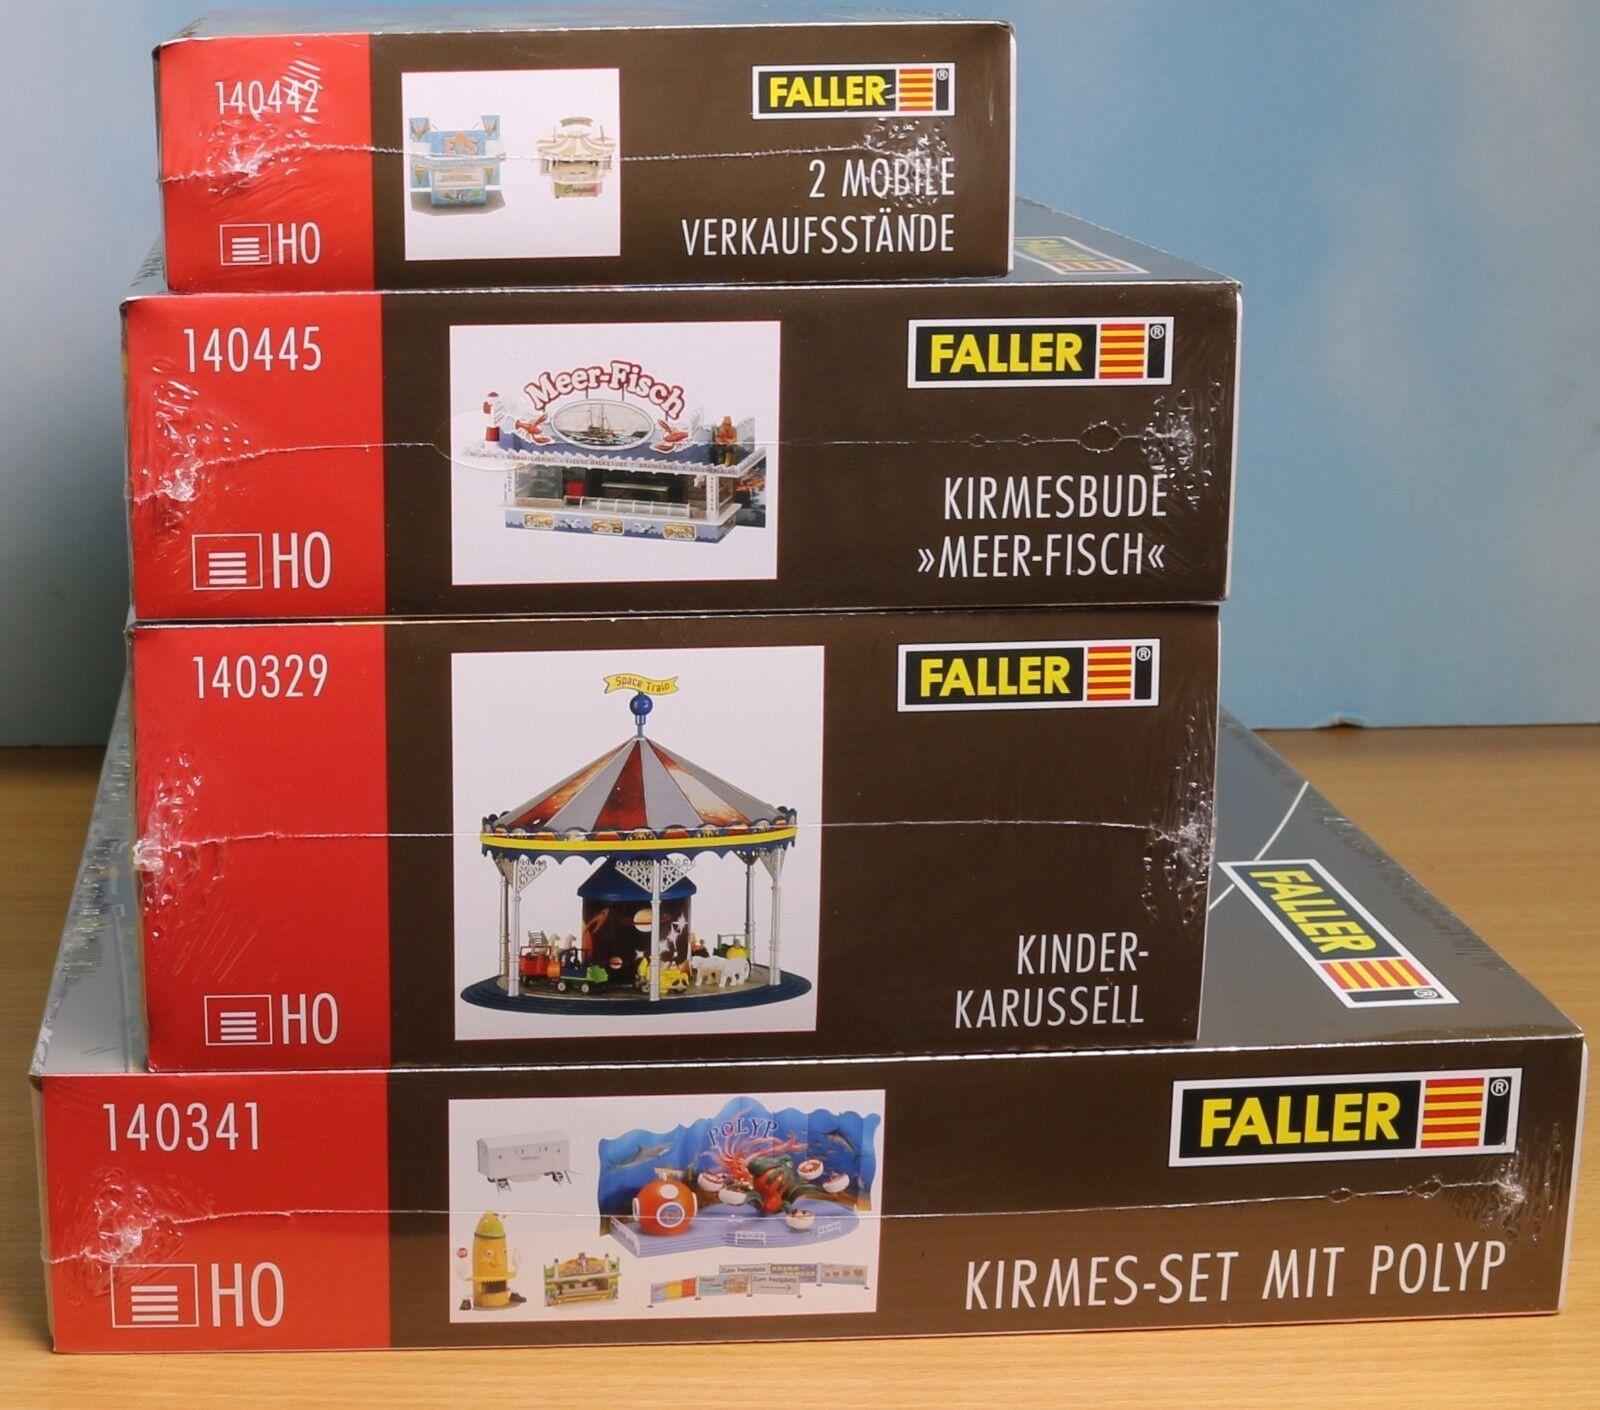 Faller 140341, 140329, 140445, 140442, traccia h0, KIT Guillaume-pacchetto 3